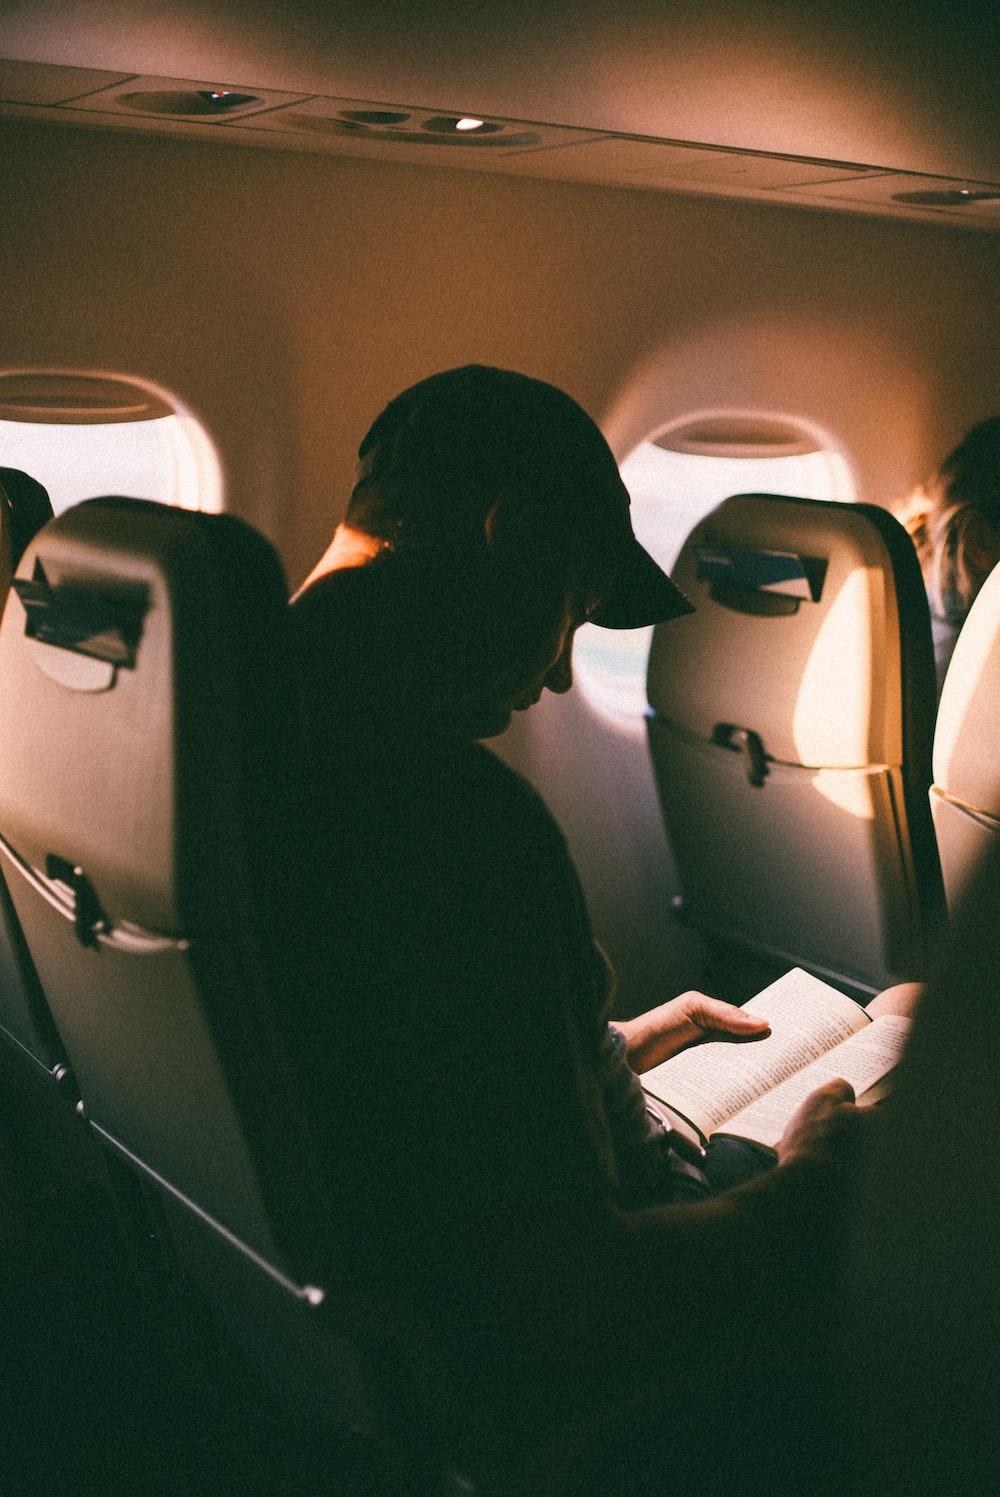 man sitting inside plane reading book